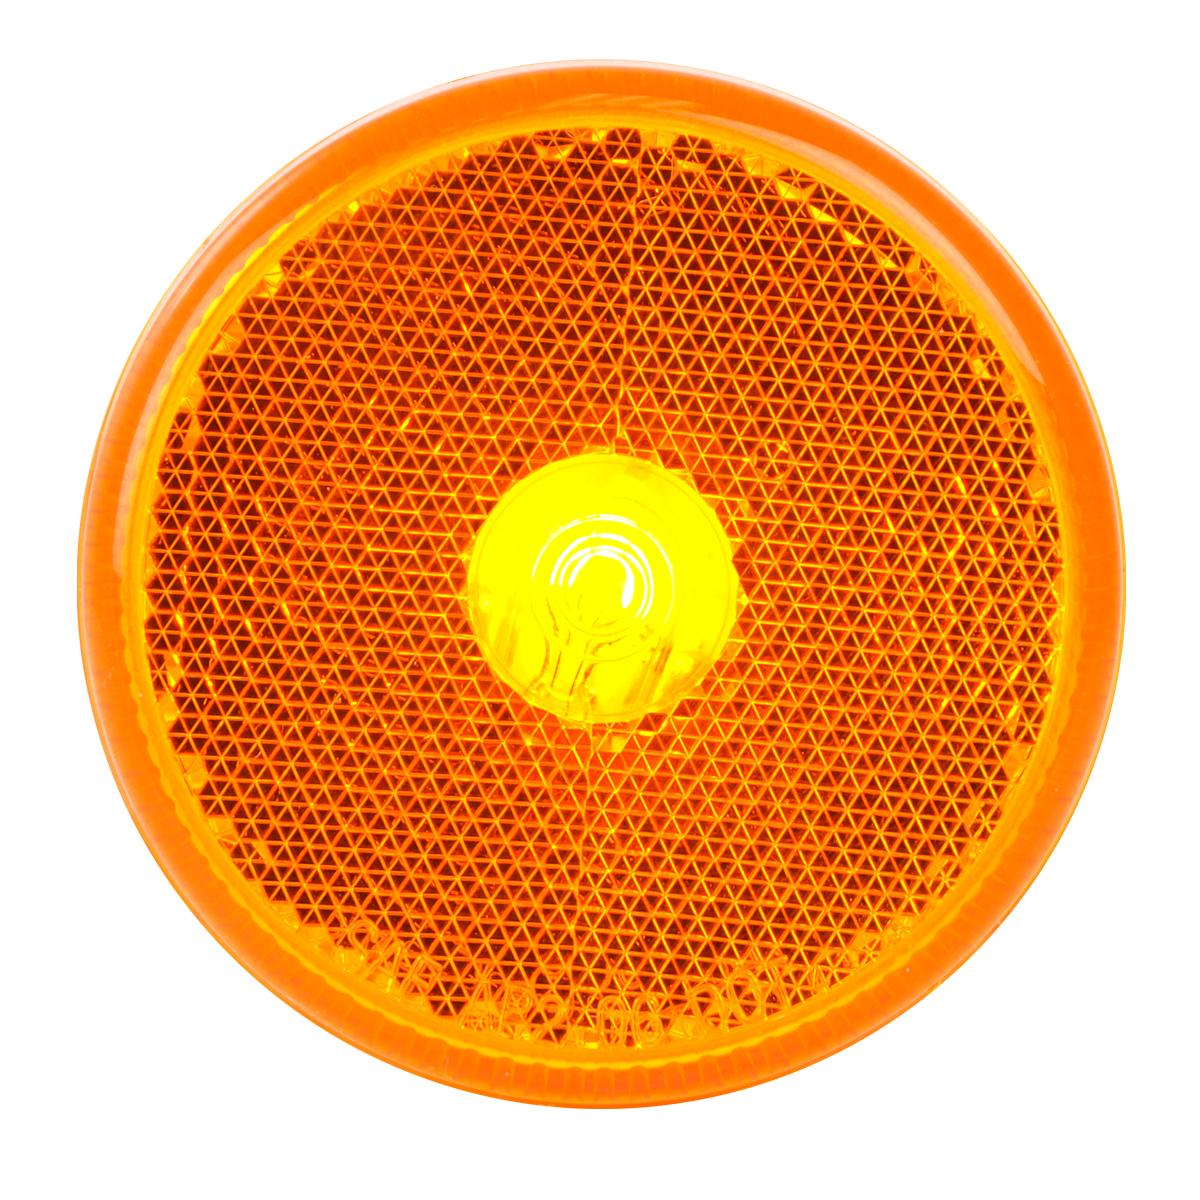 "#80713 2 ½"" Round Incandescent Flat Amber/Amber Light"